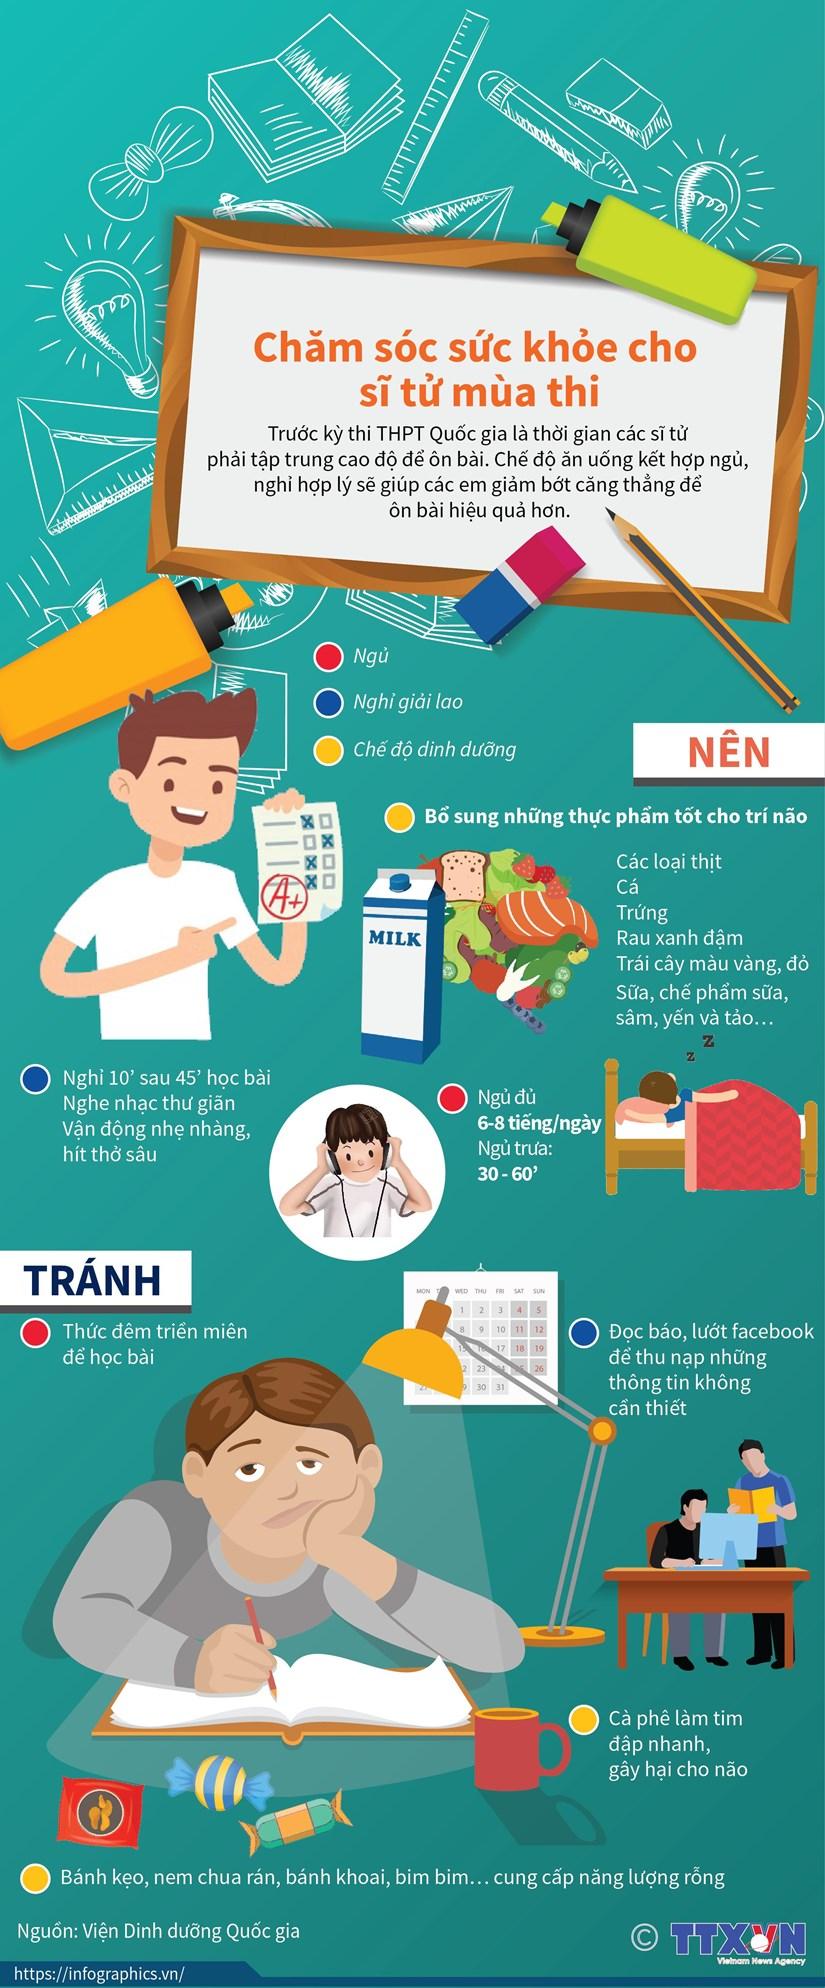 [Infographics] Cham soc suc khoe cho sy tu mua thi hinh anh 1